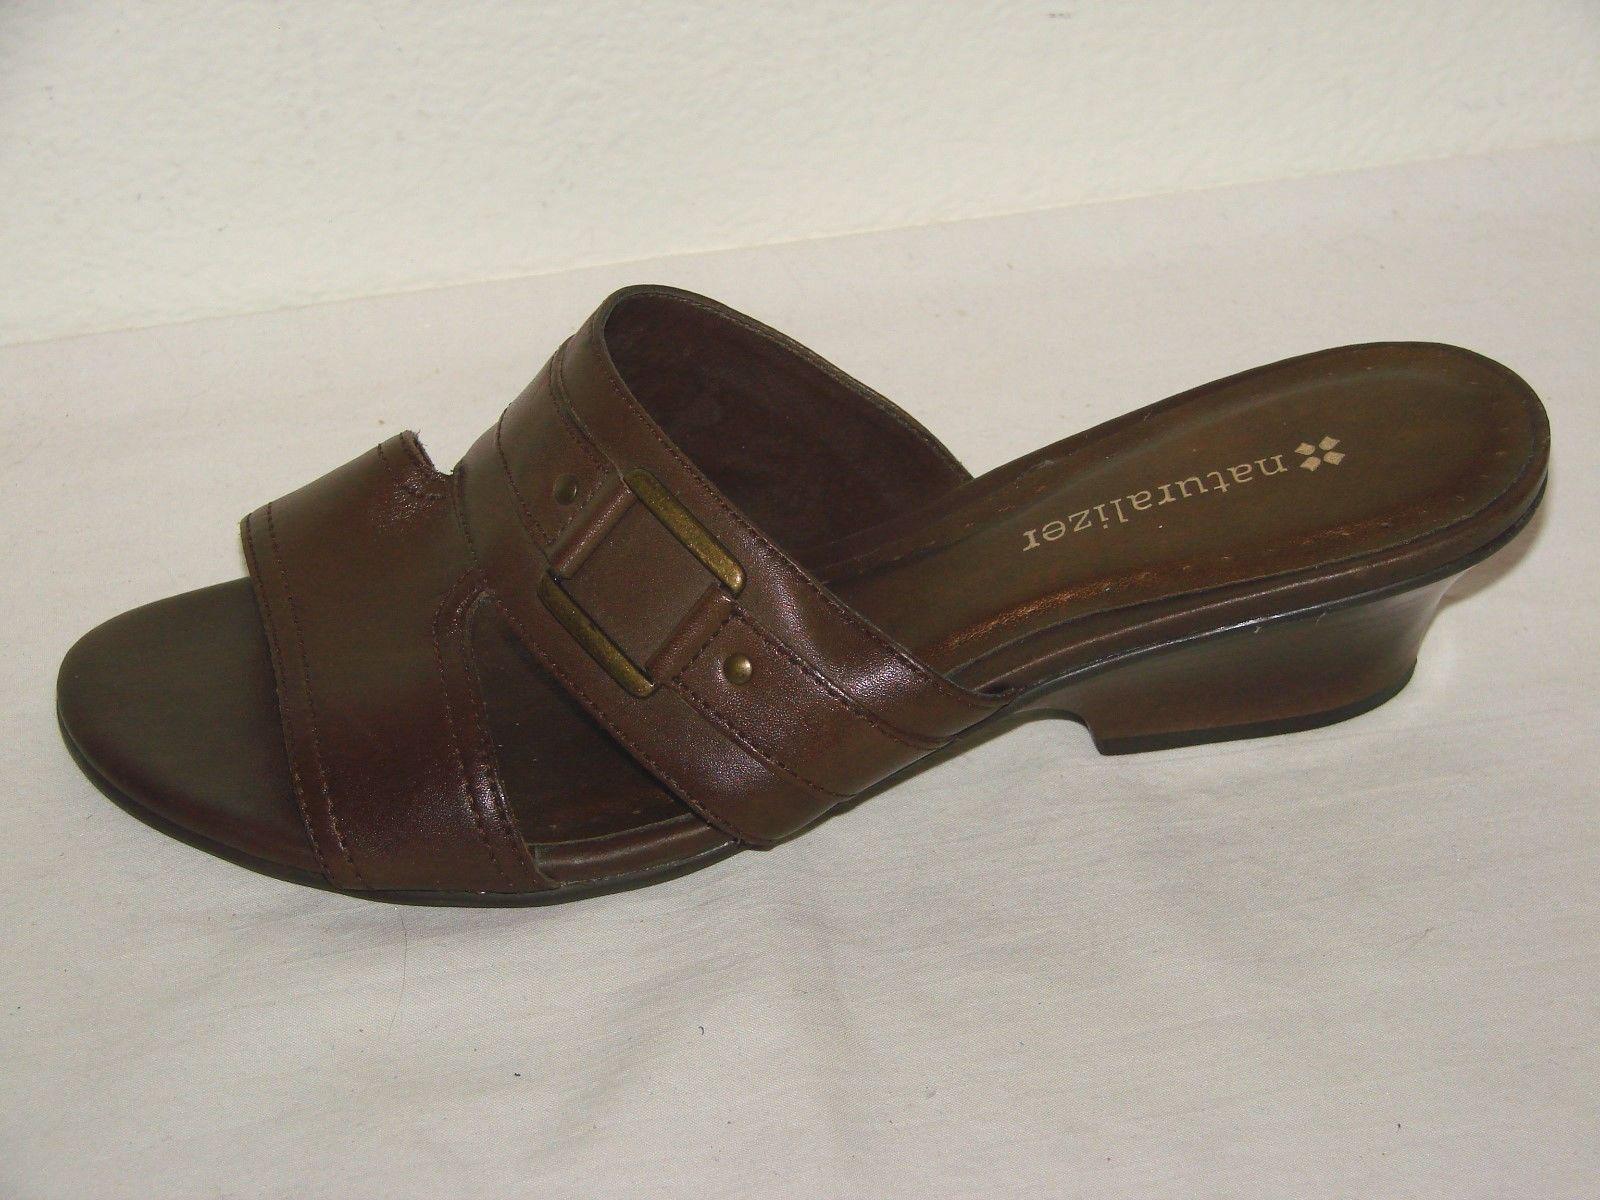 Naturalizer Womens Brown Leather Slide Sandal Shoe Size - Size Shoe 6M 7e6014